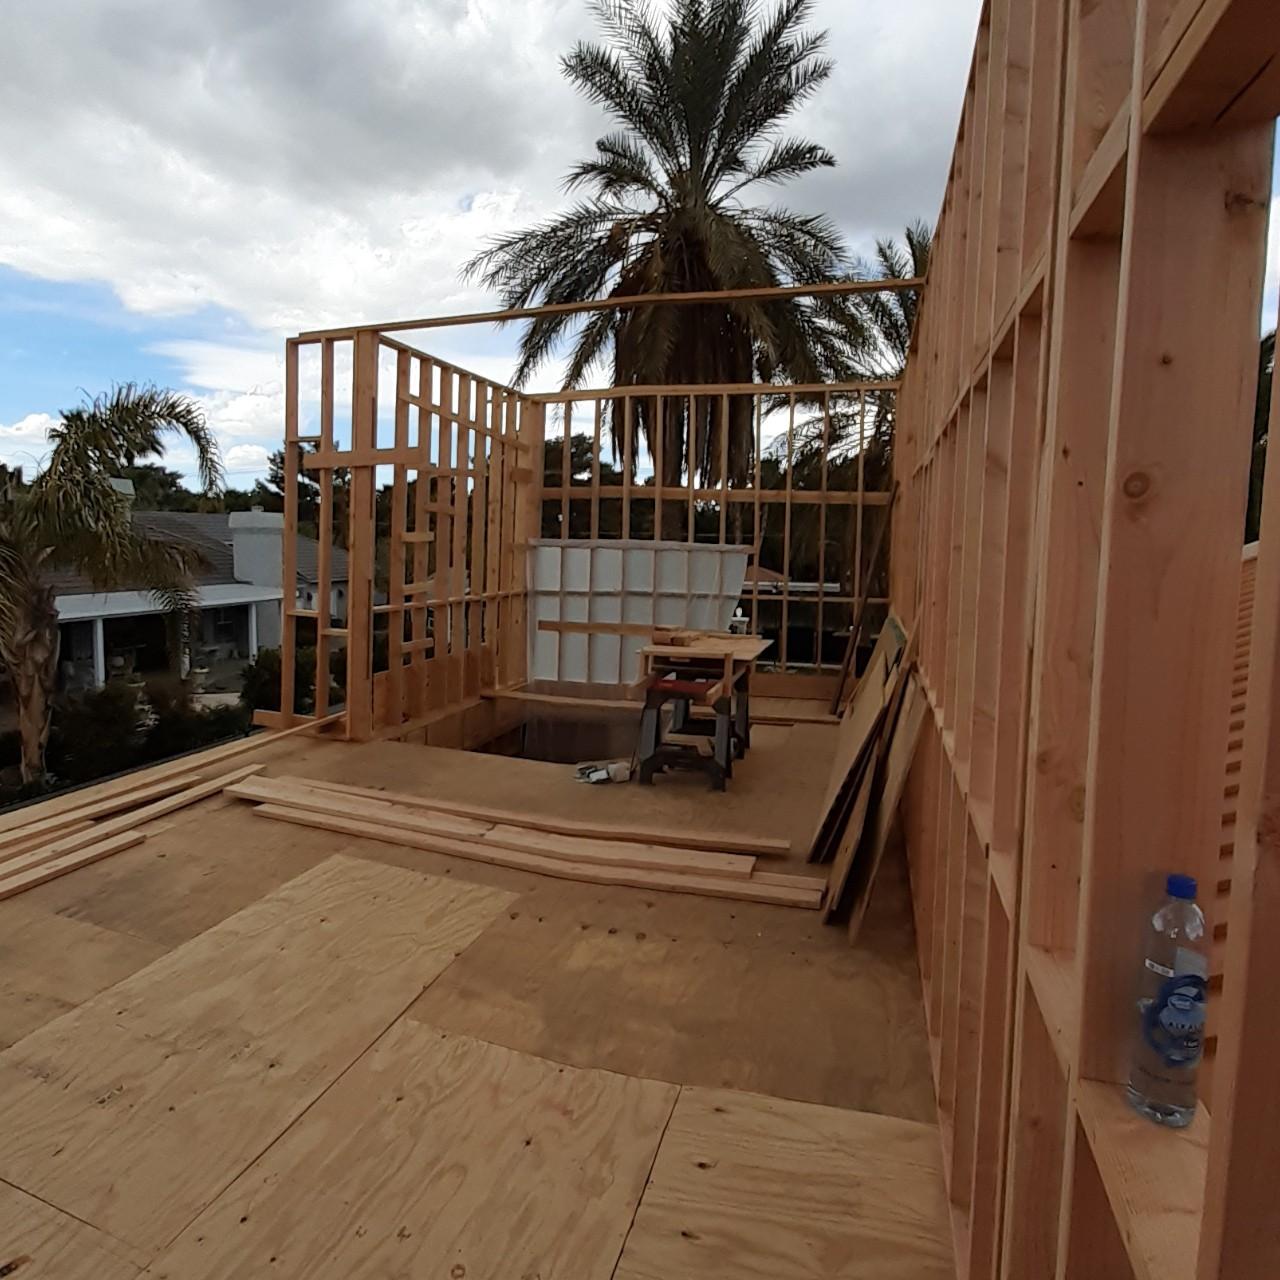 carpentry-wood-framing-second-floor-home-addition--framing-89